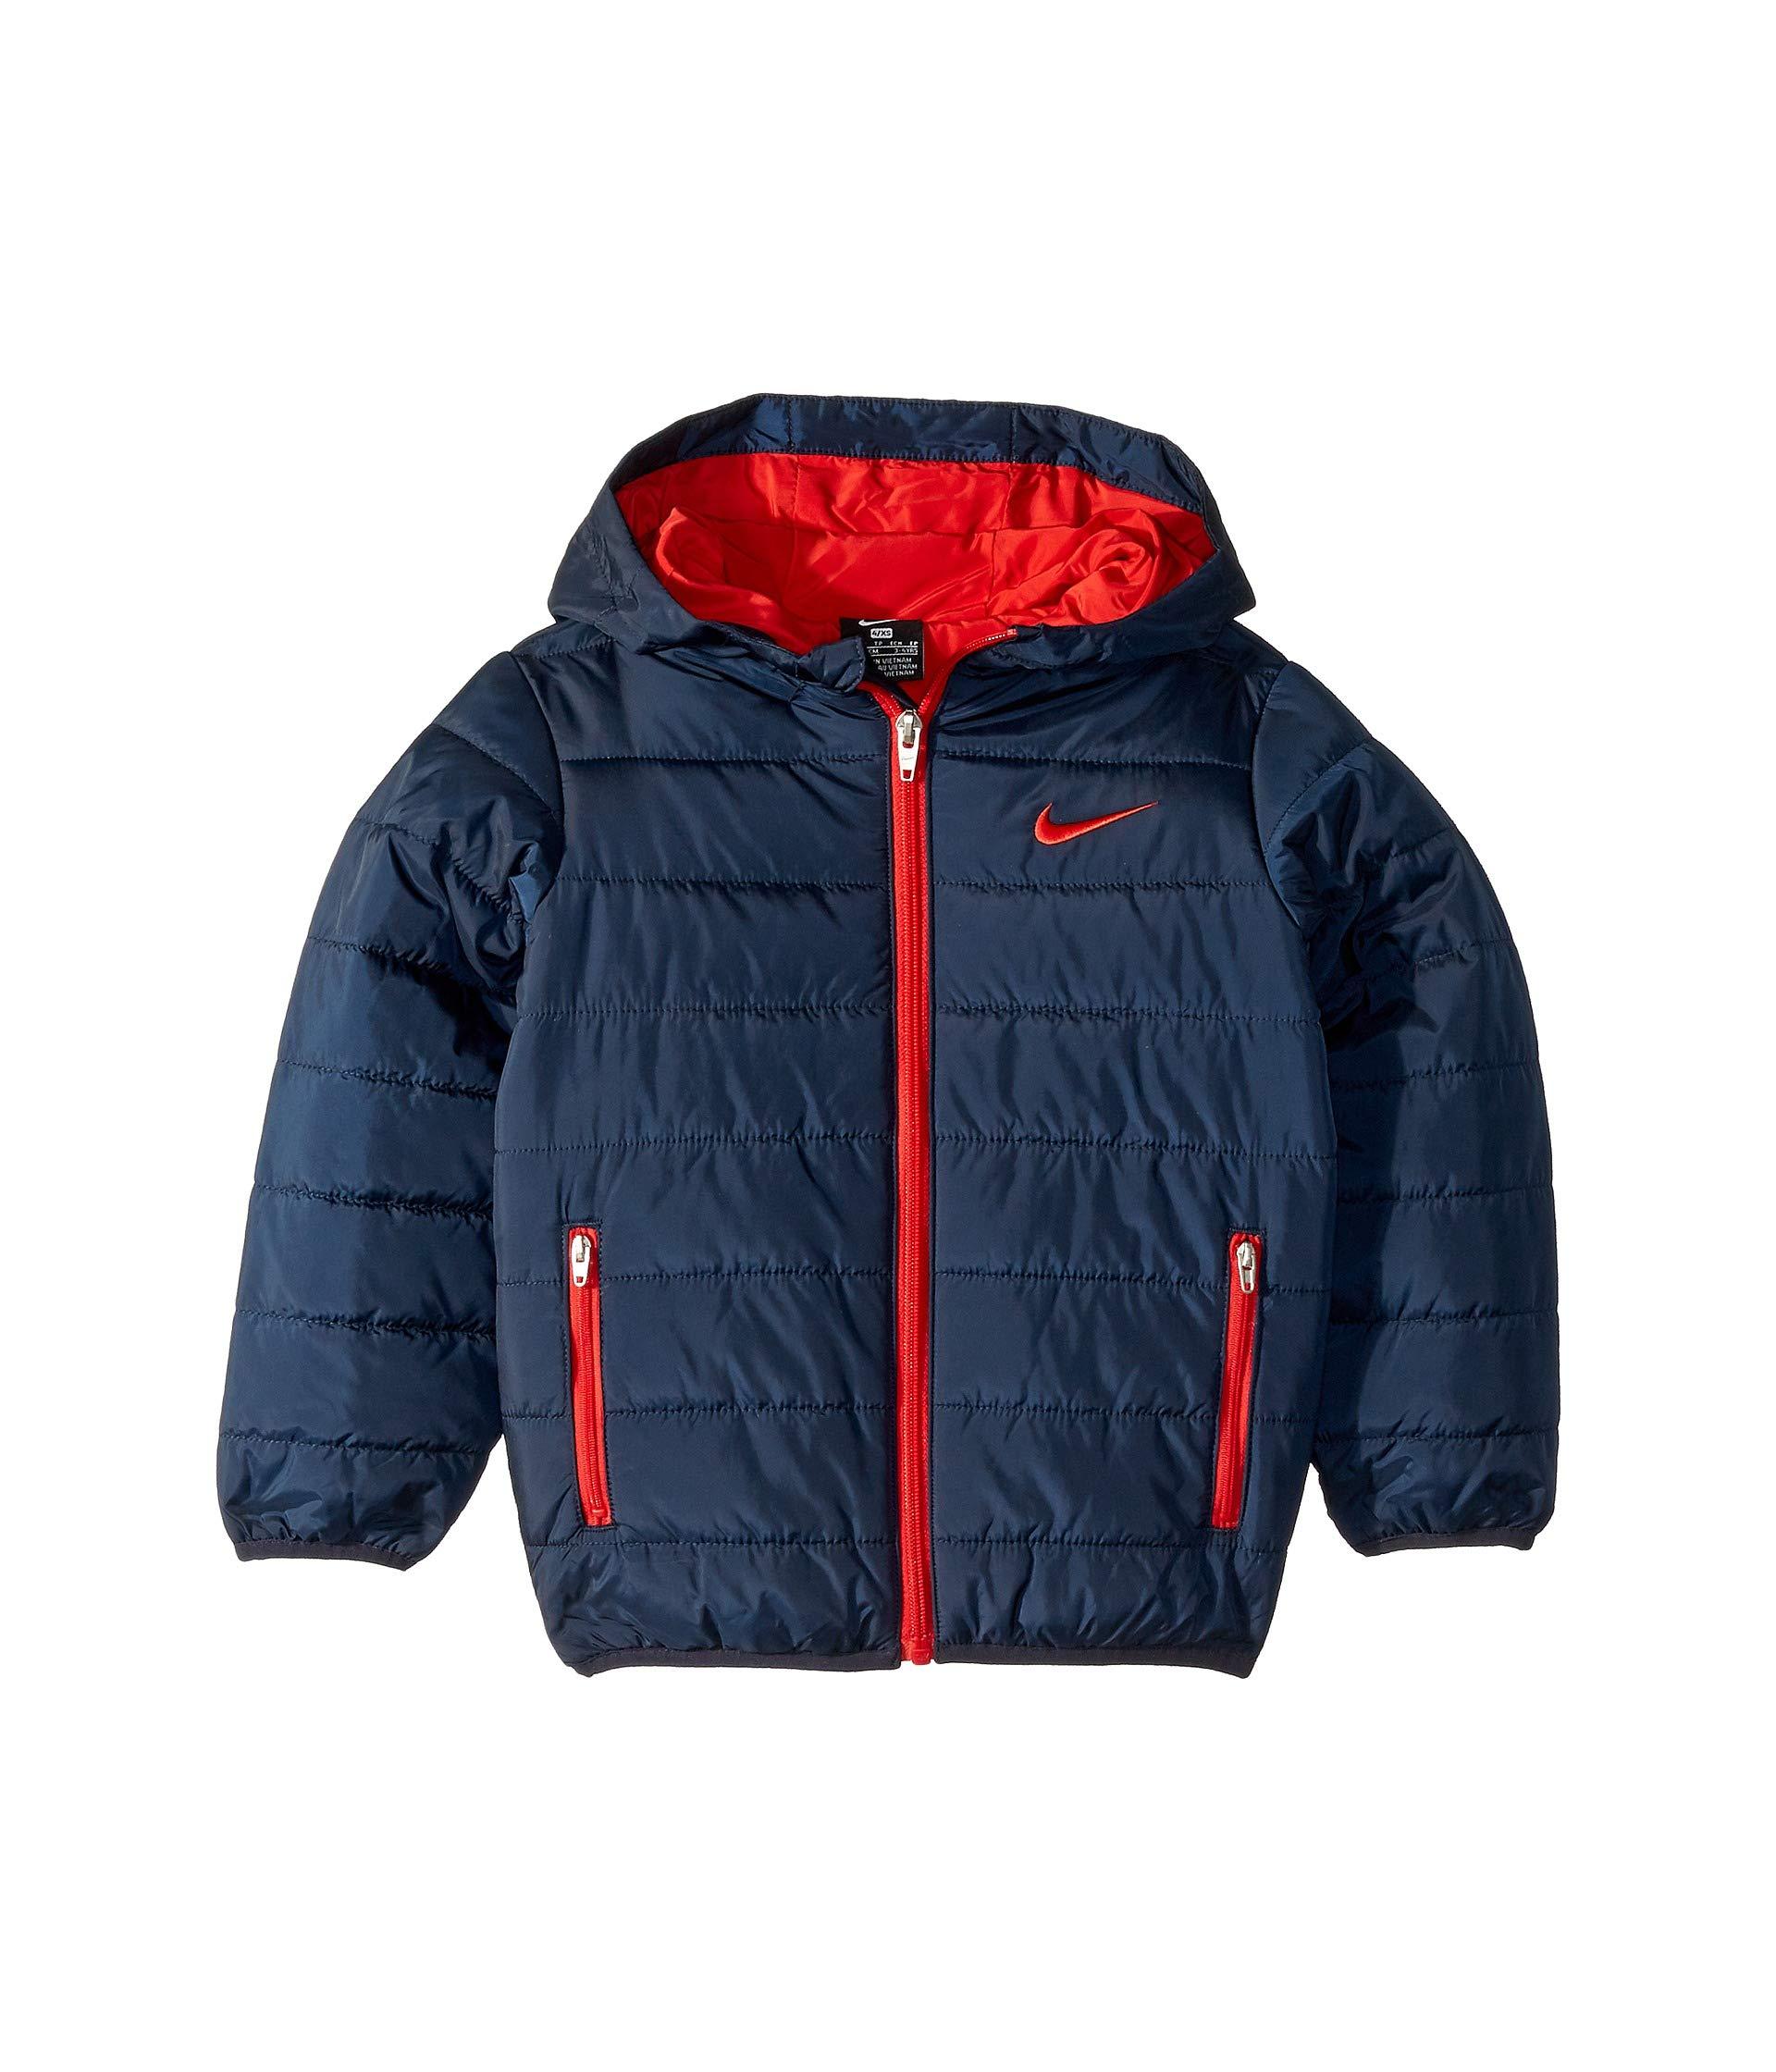 Nike Kids Boy's Quilted Jacket (Little Kids) Obsidian/University Red 6